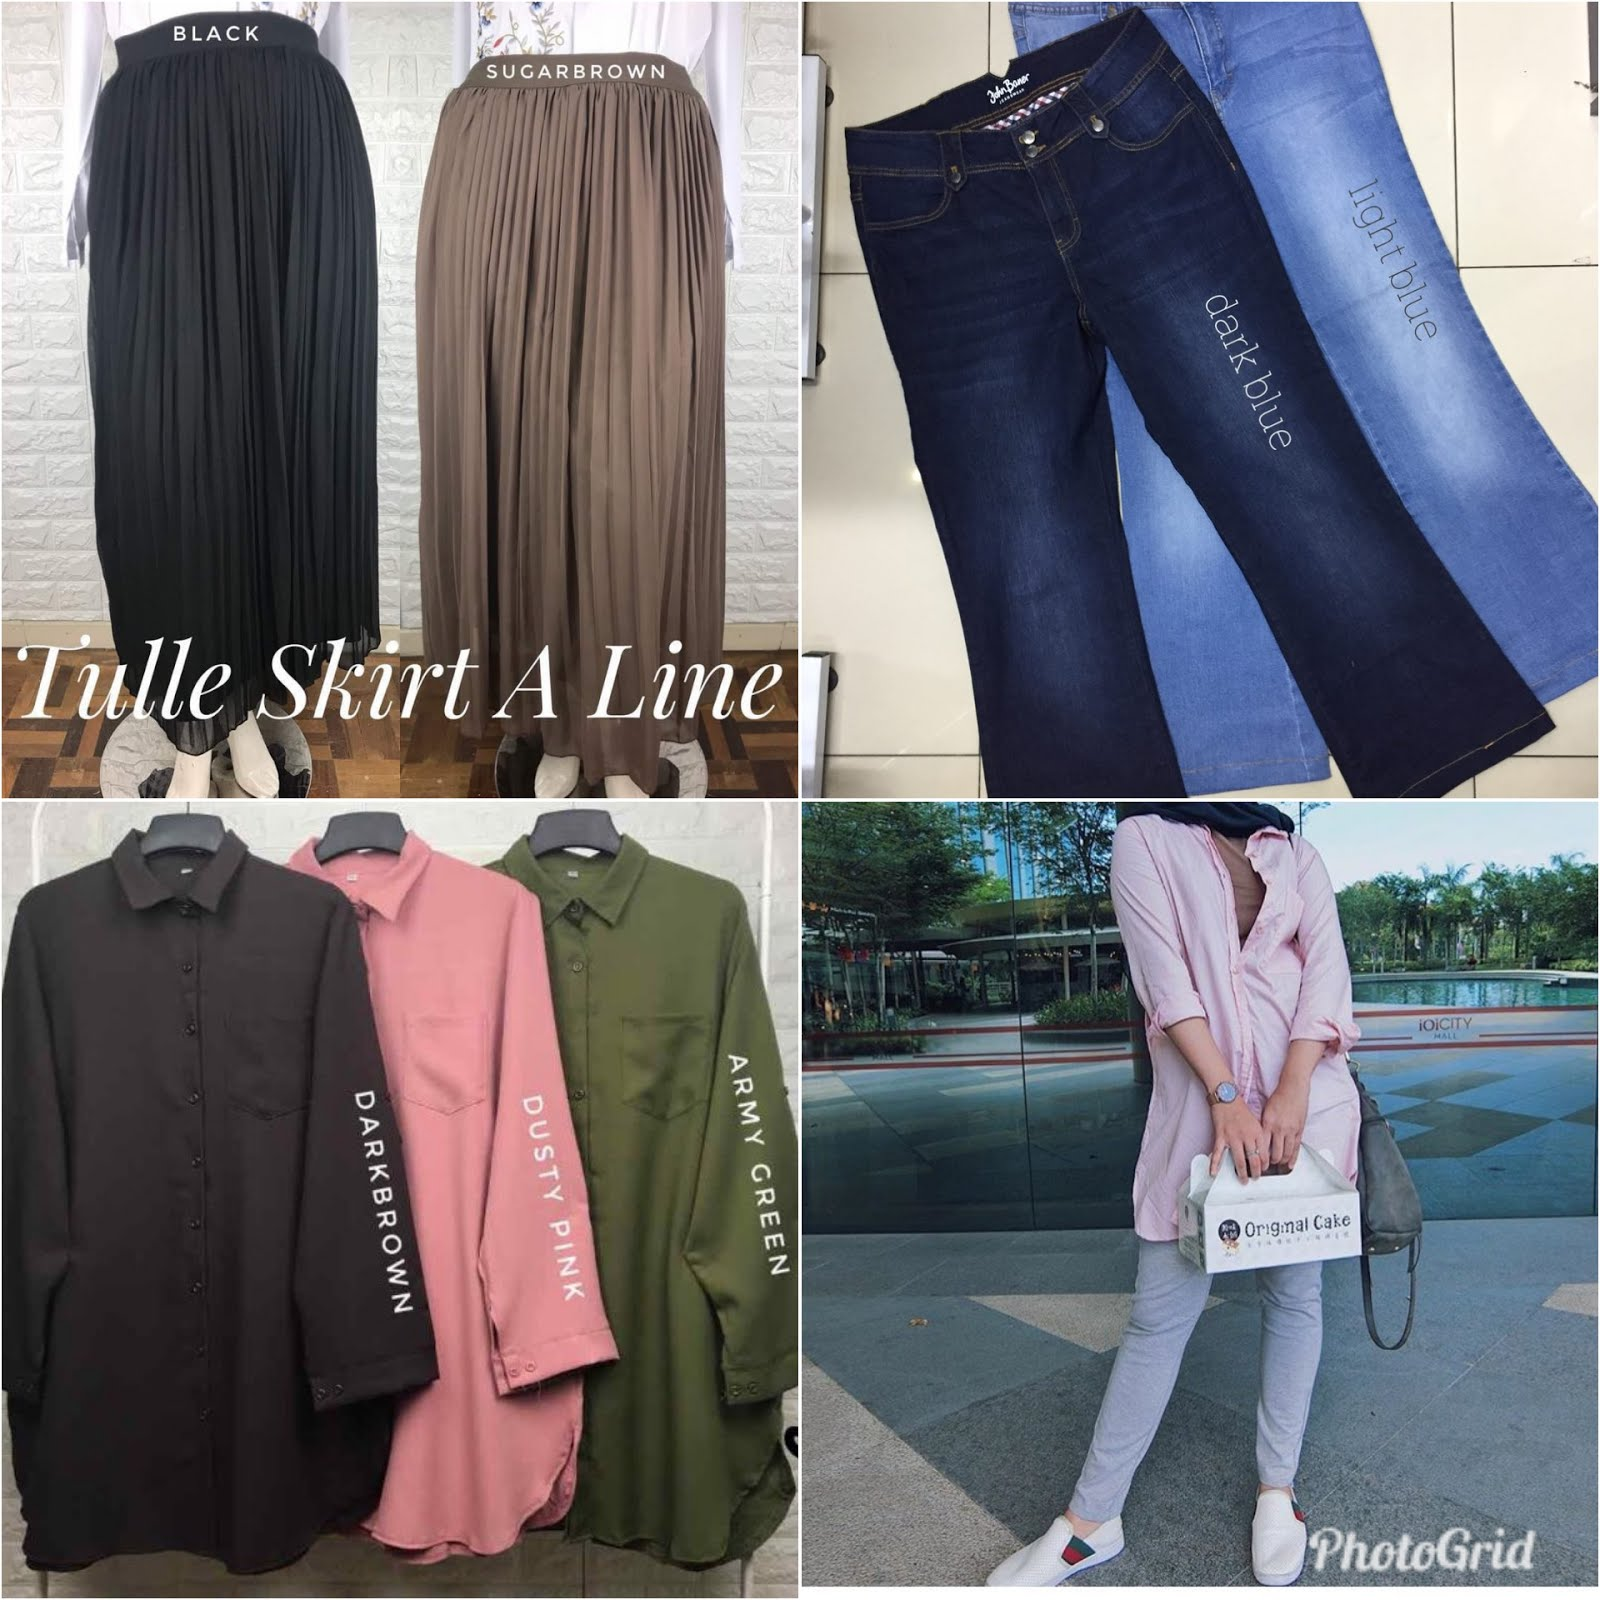 Pelbagai koleksi baju casual jeans, jacket, palazo, blouse, skirt tau